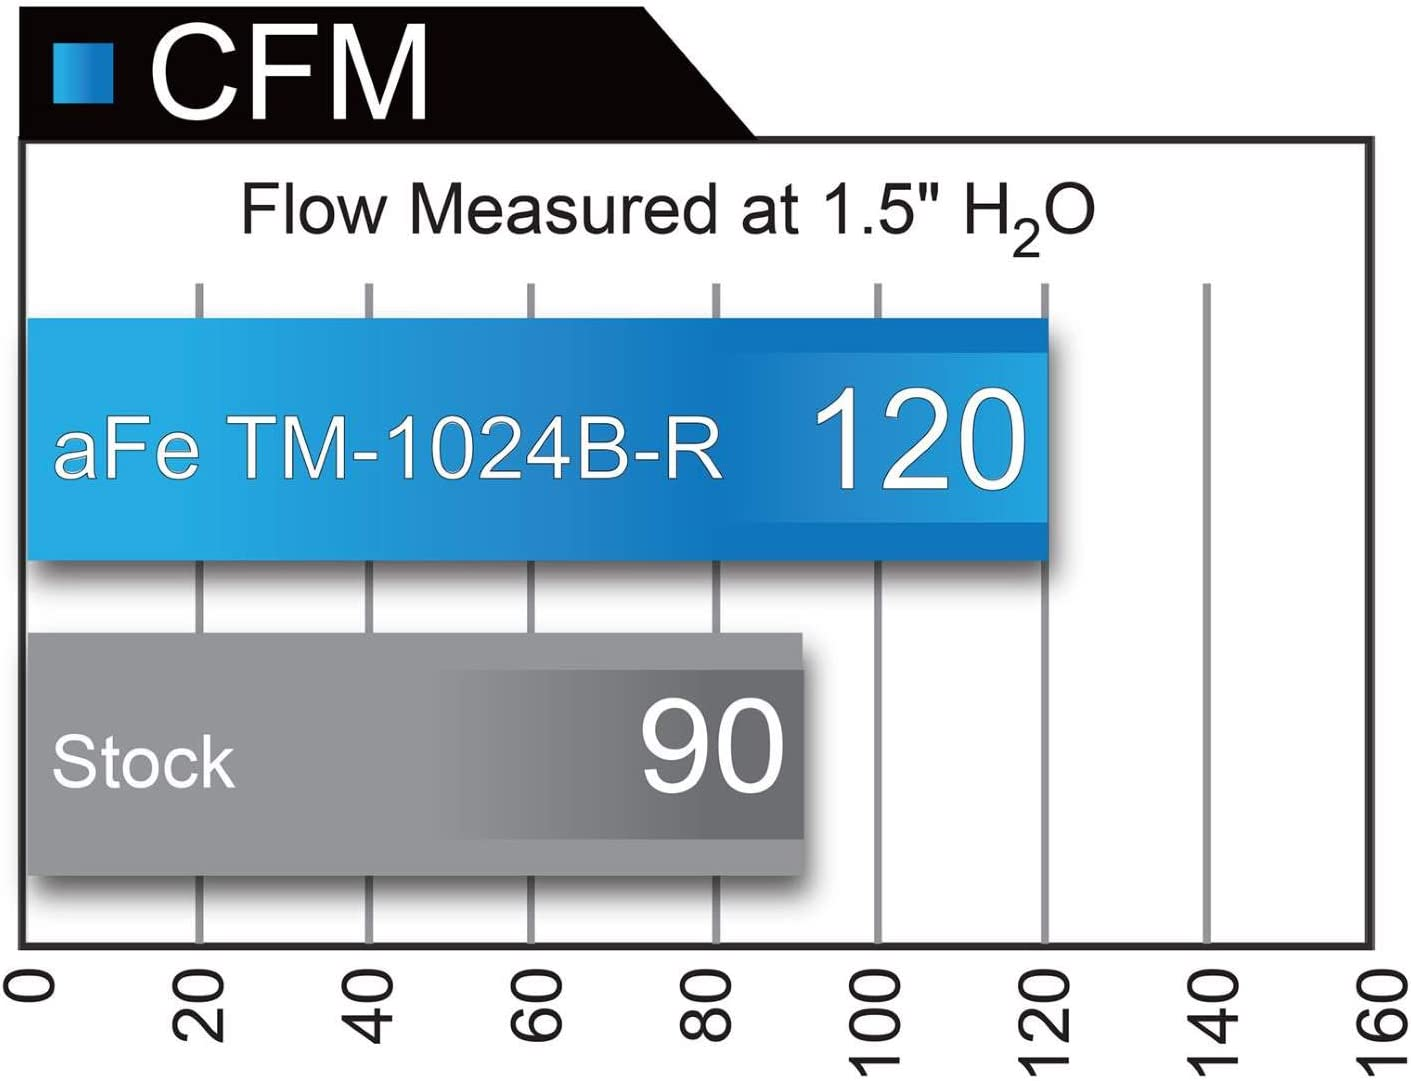 Dry, 3-Layer Filter aFe Power TM-1024B-D Takeda Cold Air Intake System for Honda